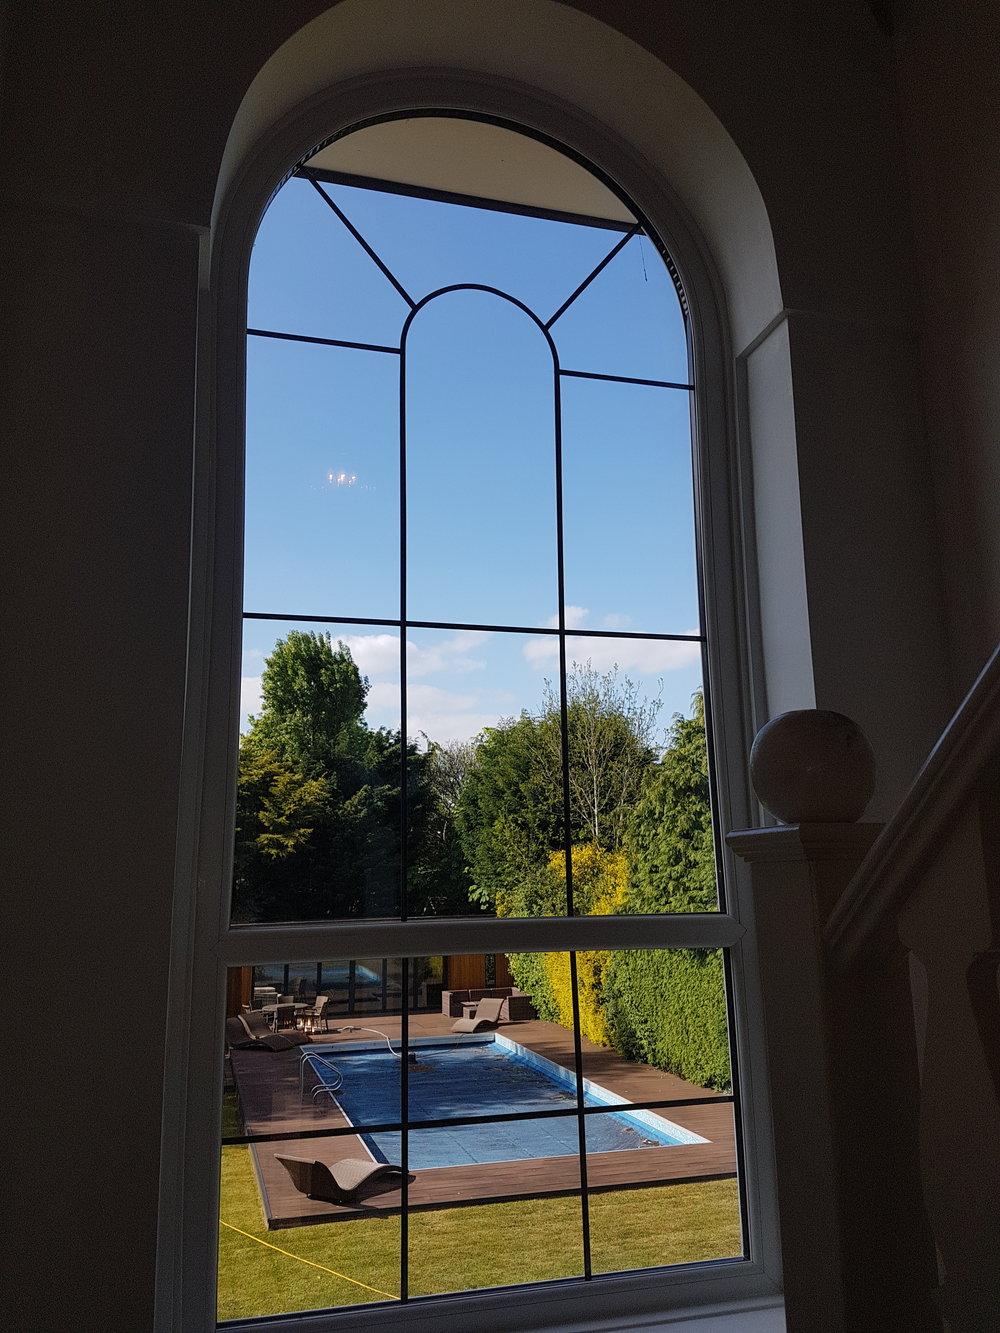 OUR unique pvcu bespoke arch window